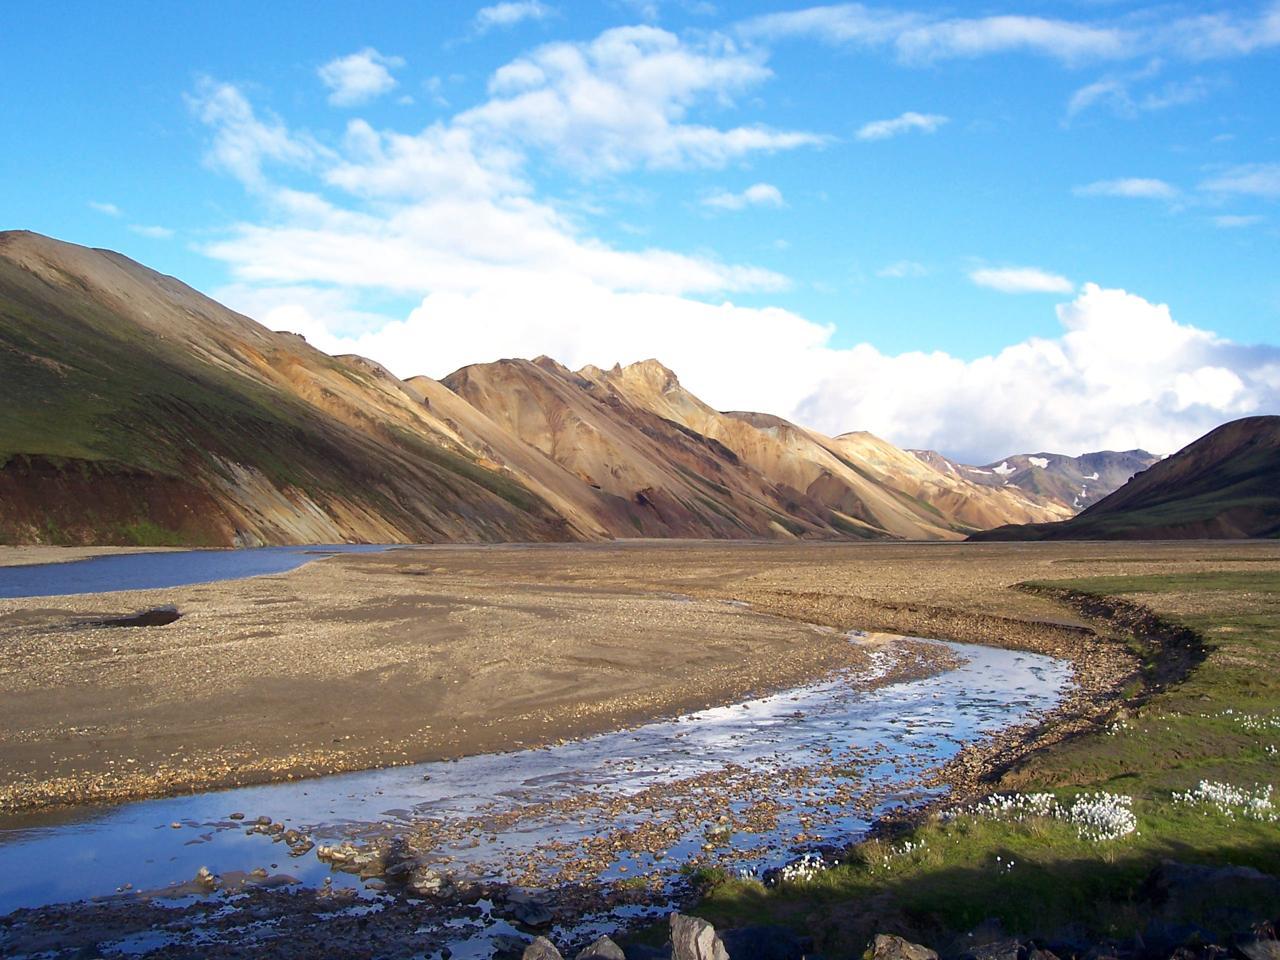 Fotos Increbles Paisajes De Islandia Taringa | Holidays OO